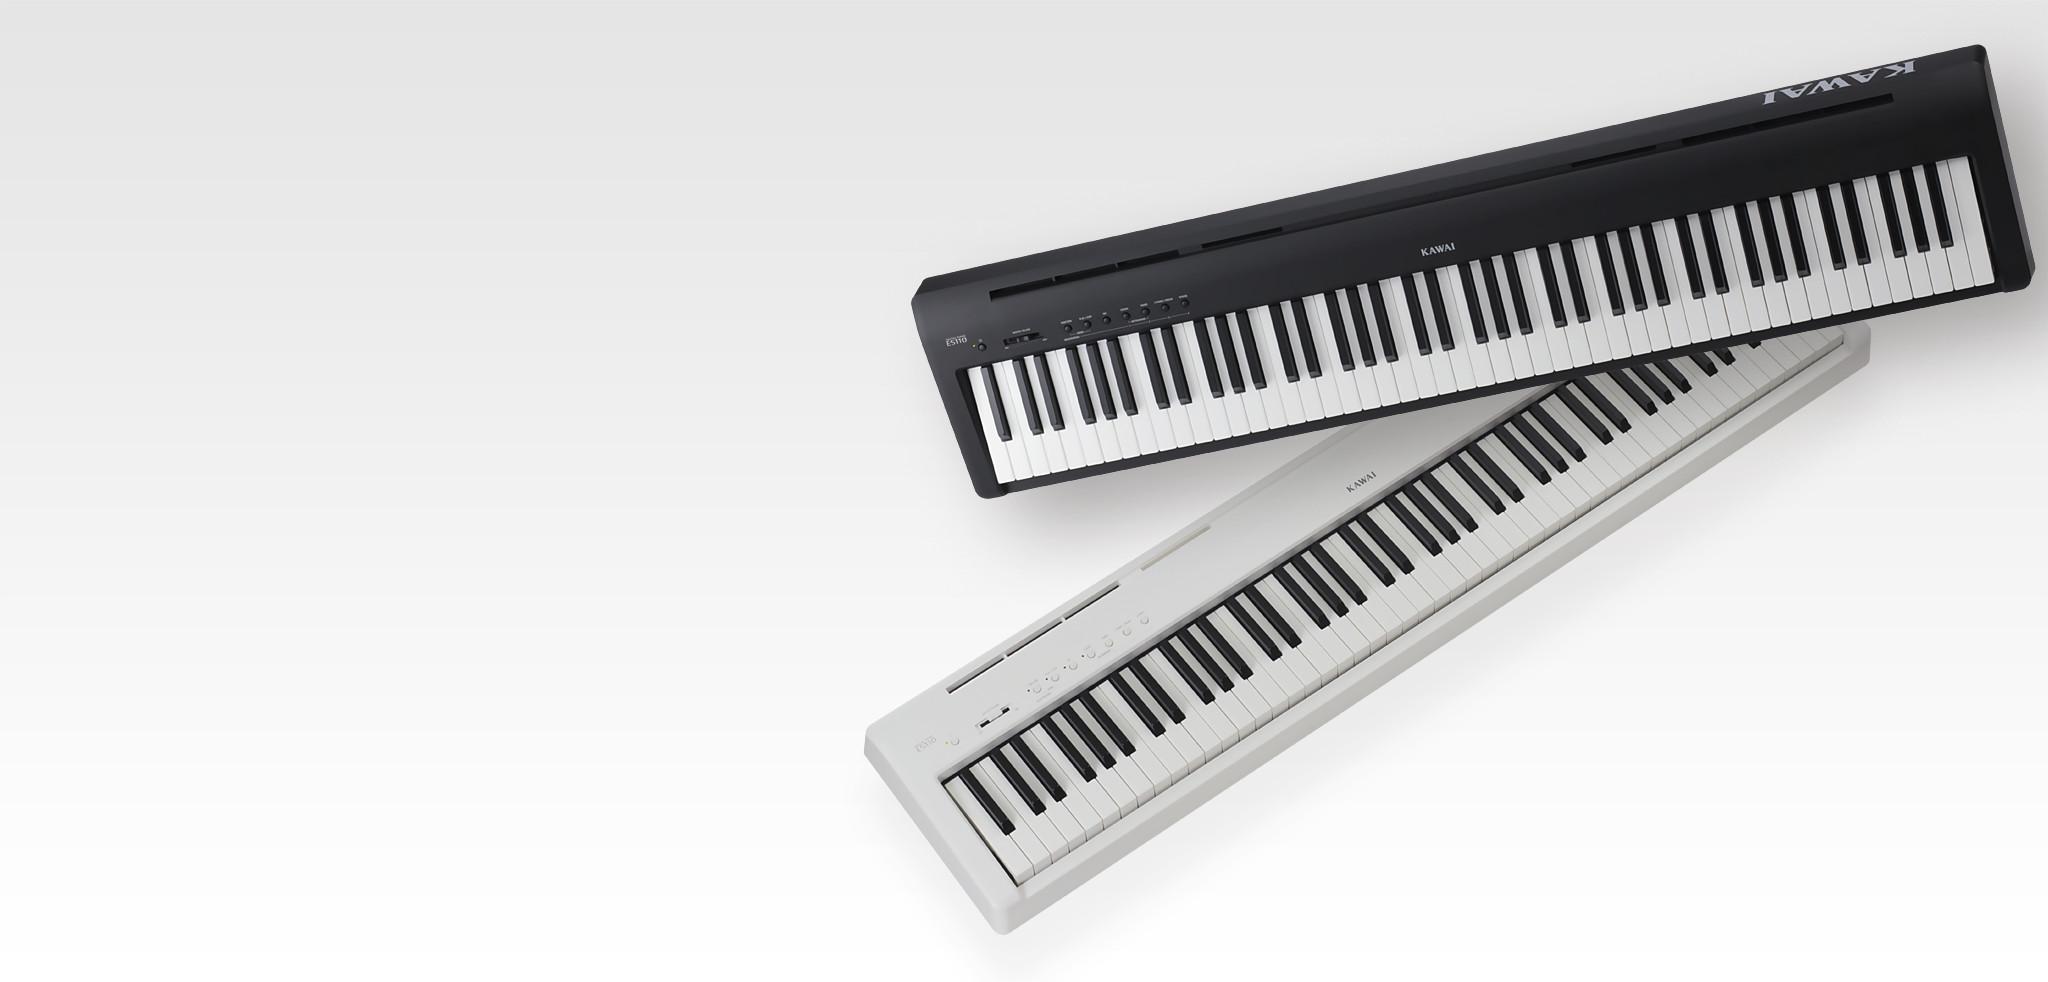 es110 digital pianos products kawai musical instruments manufacturing co ltd. Black Bedroom Furniture Sets. Home Design Ideas